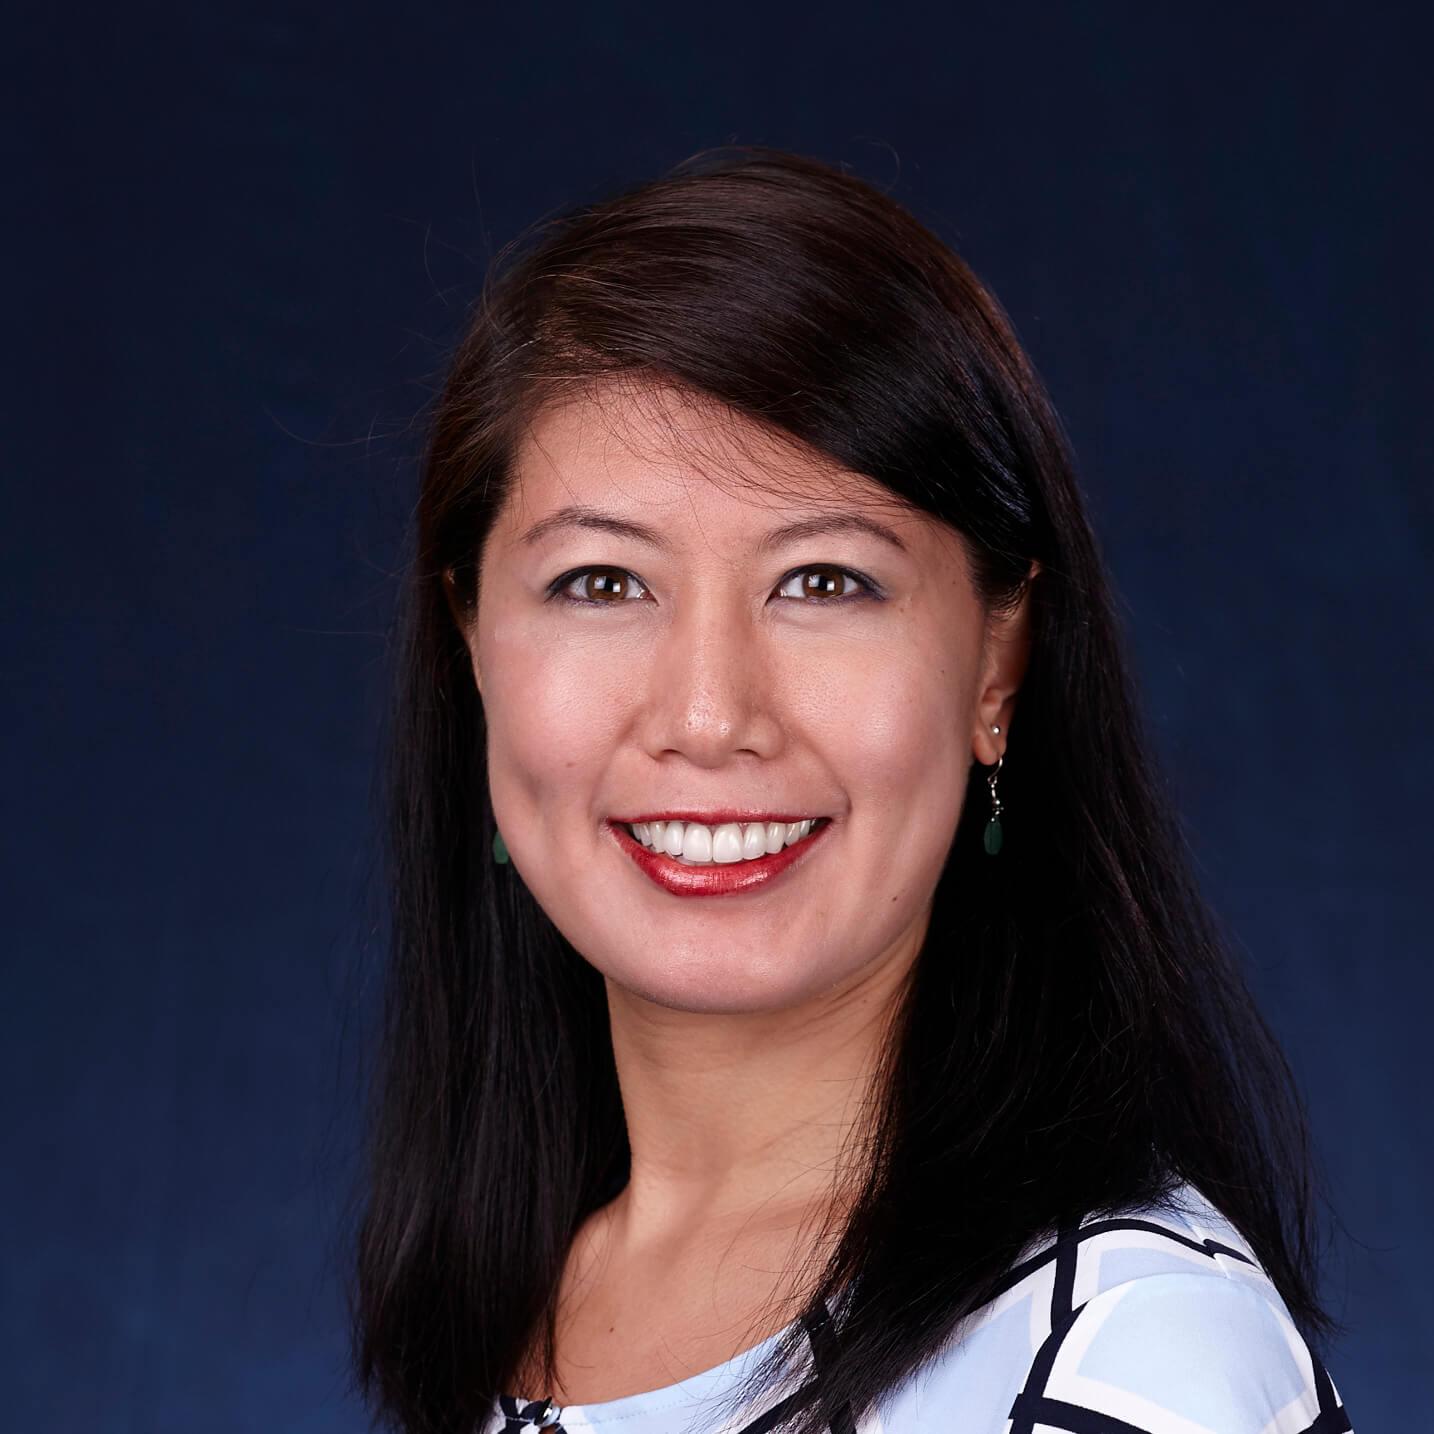 Ling Wong, PhD